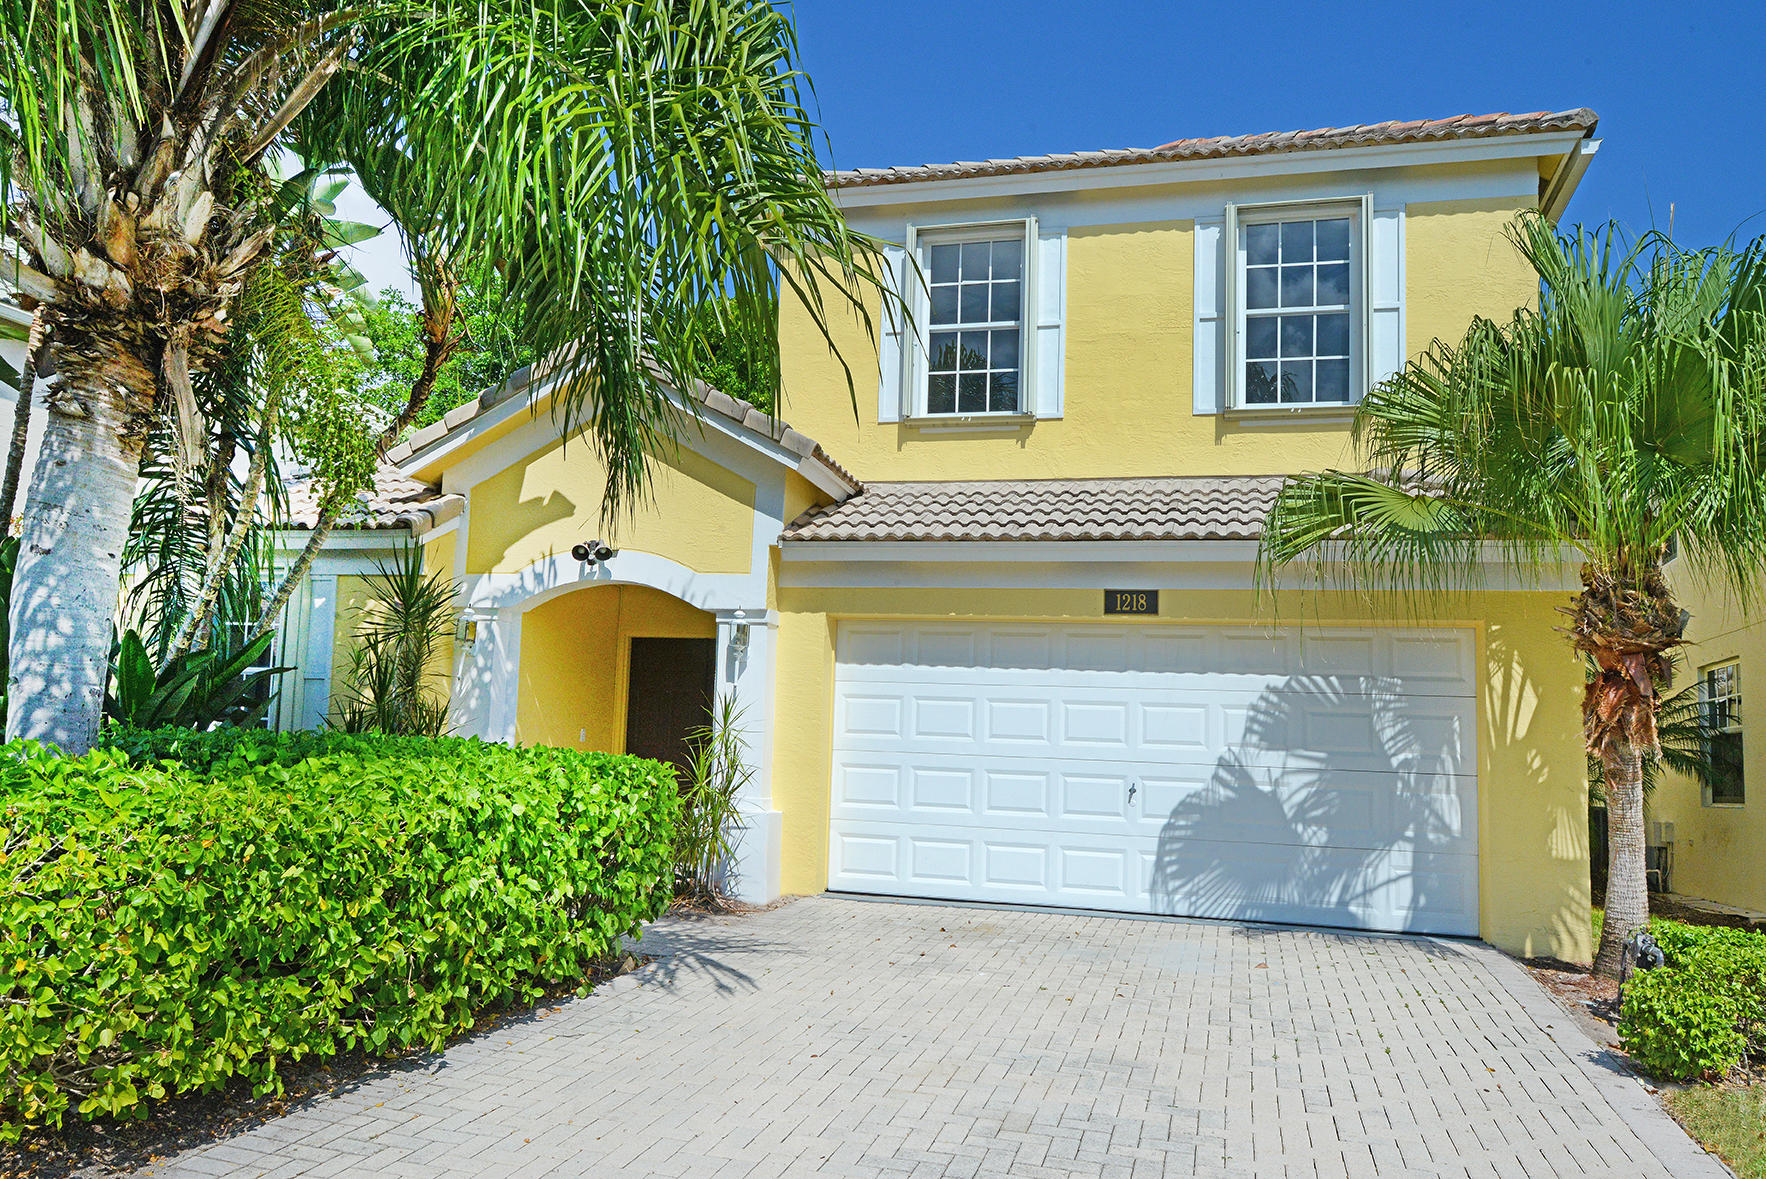 Photo of 1218 Avondale Lane, West Palm Beach, FL 33409